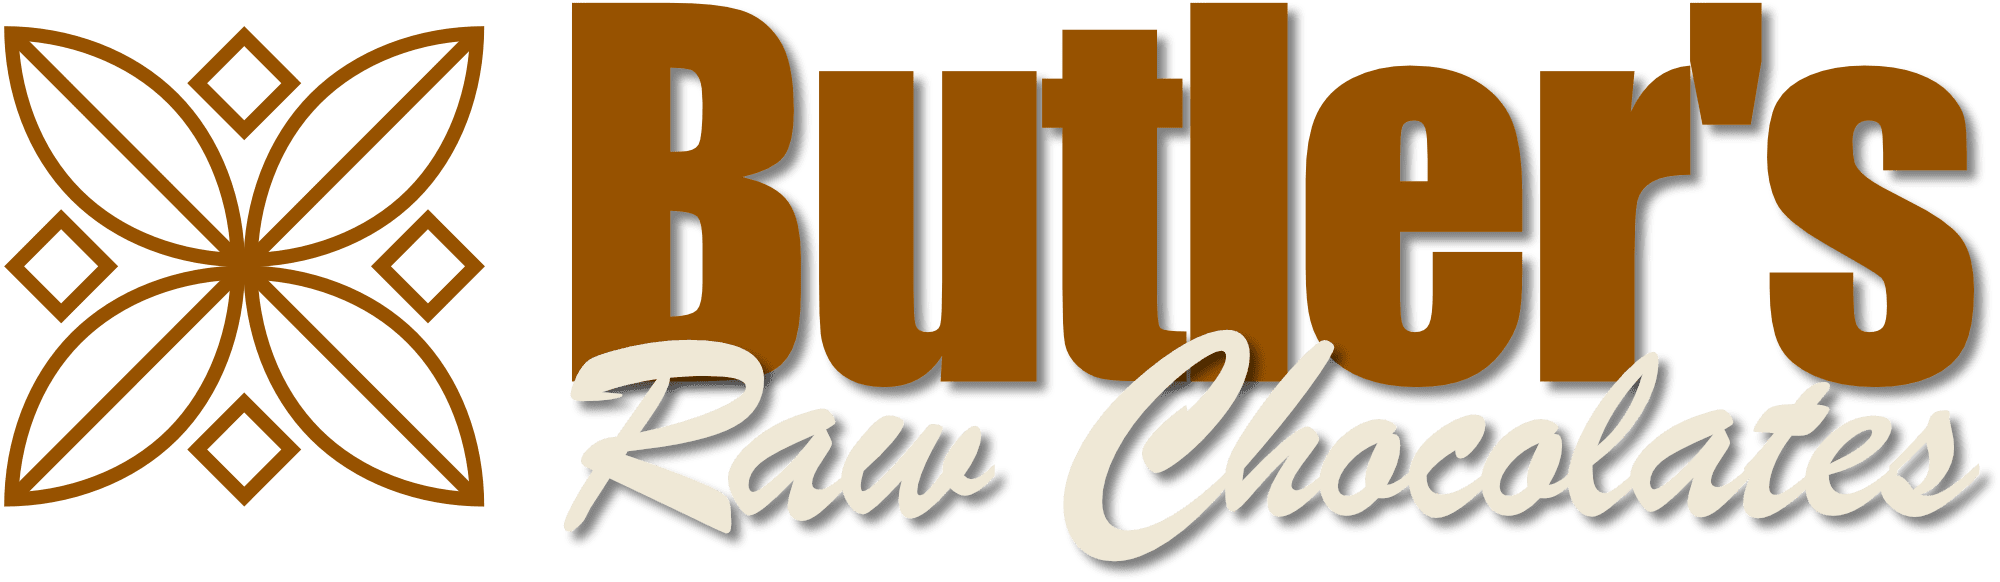 Butler's Raw Chocolates